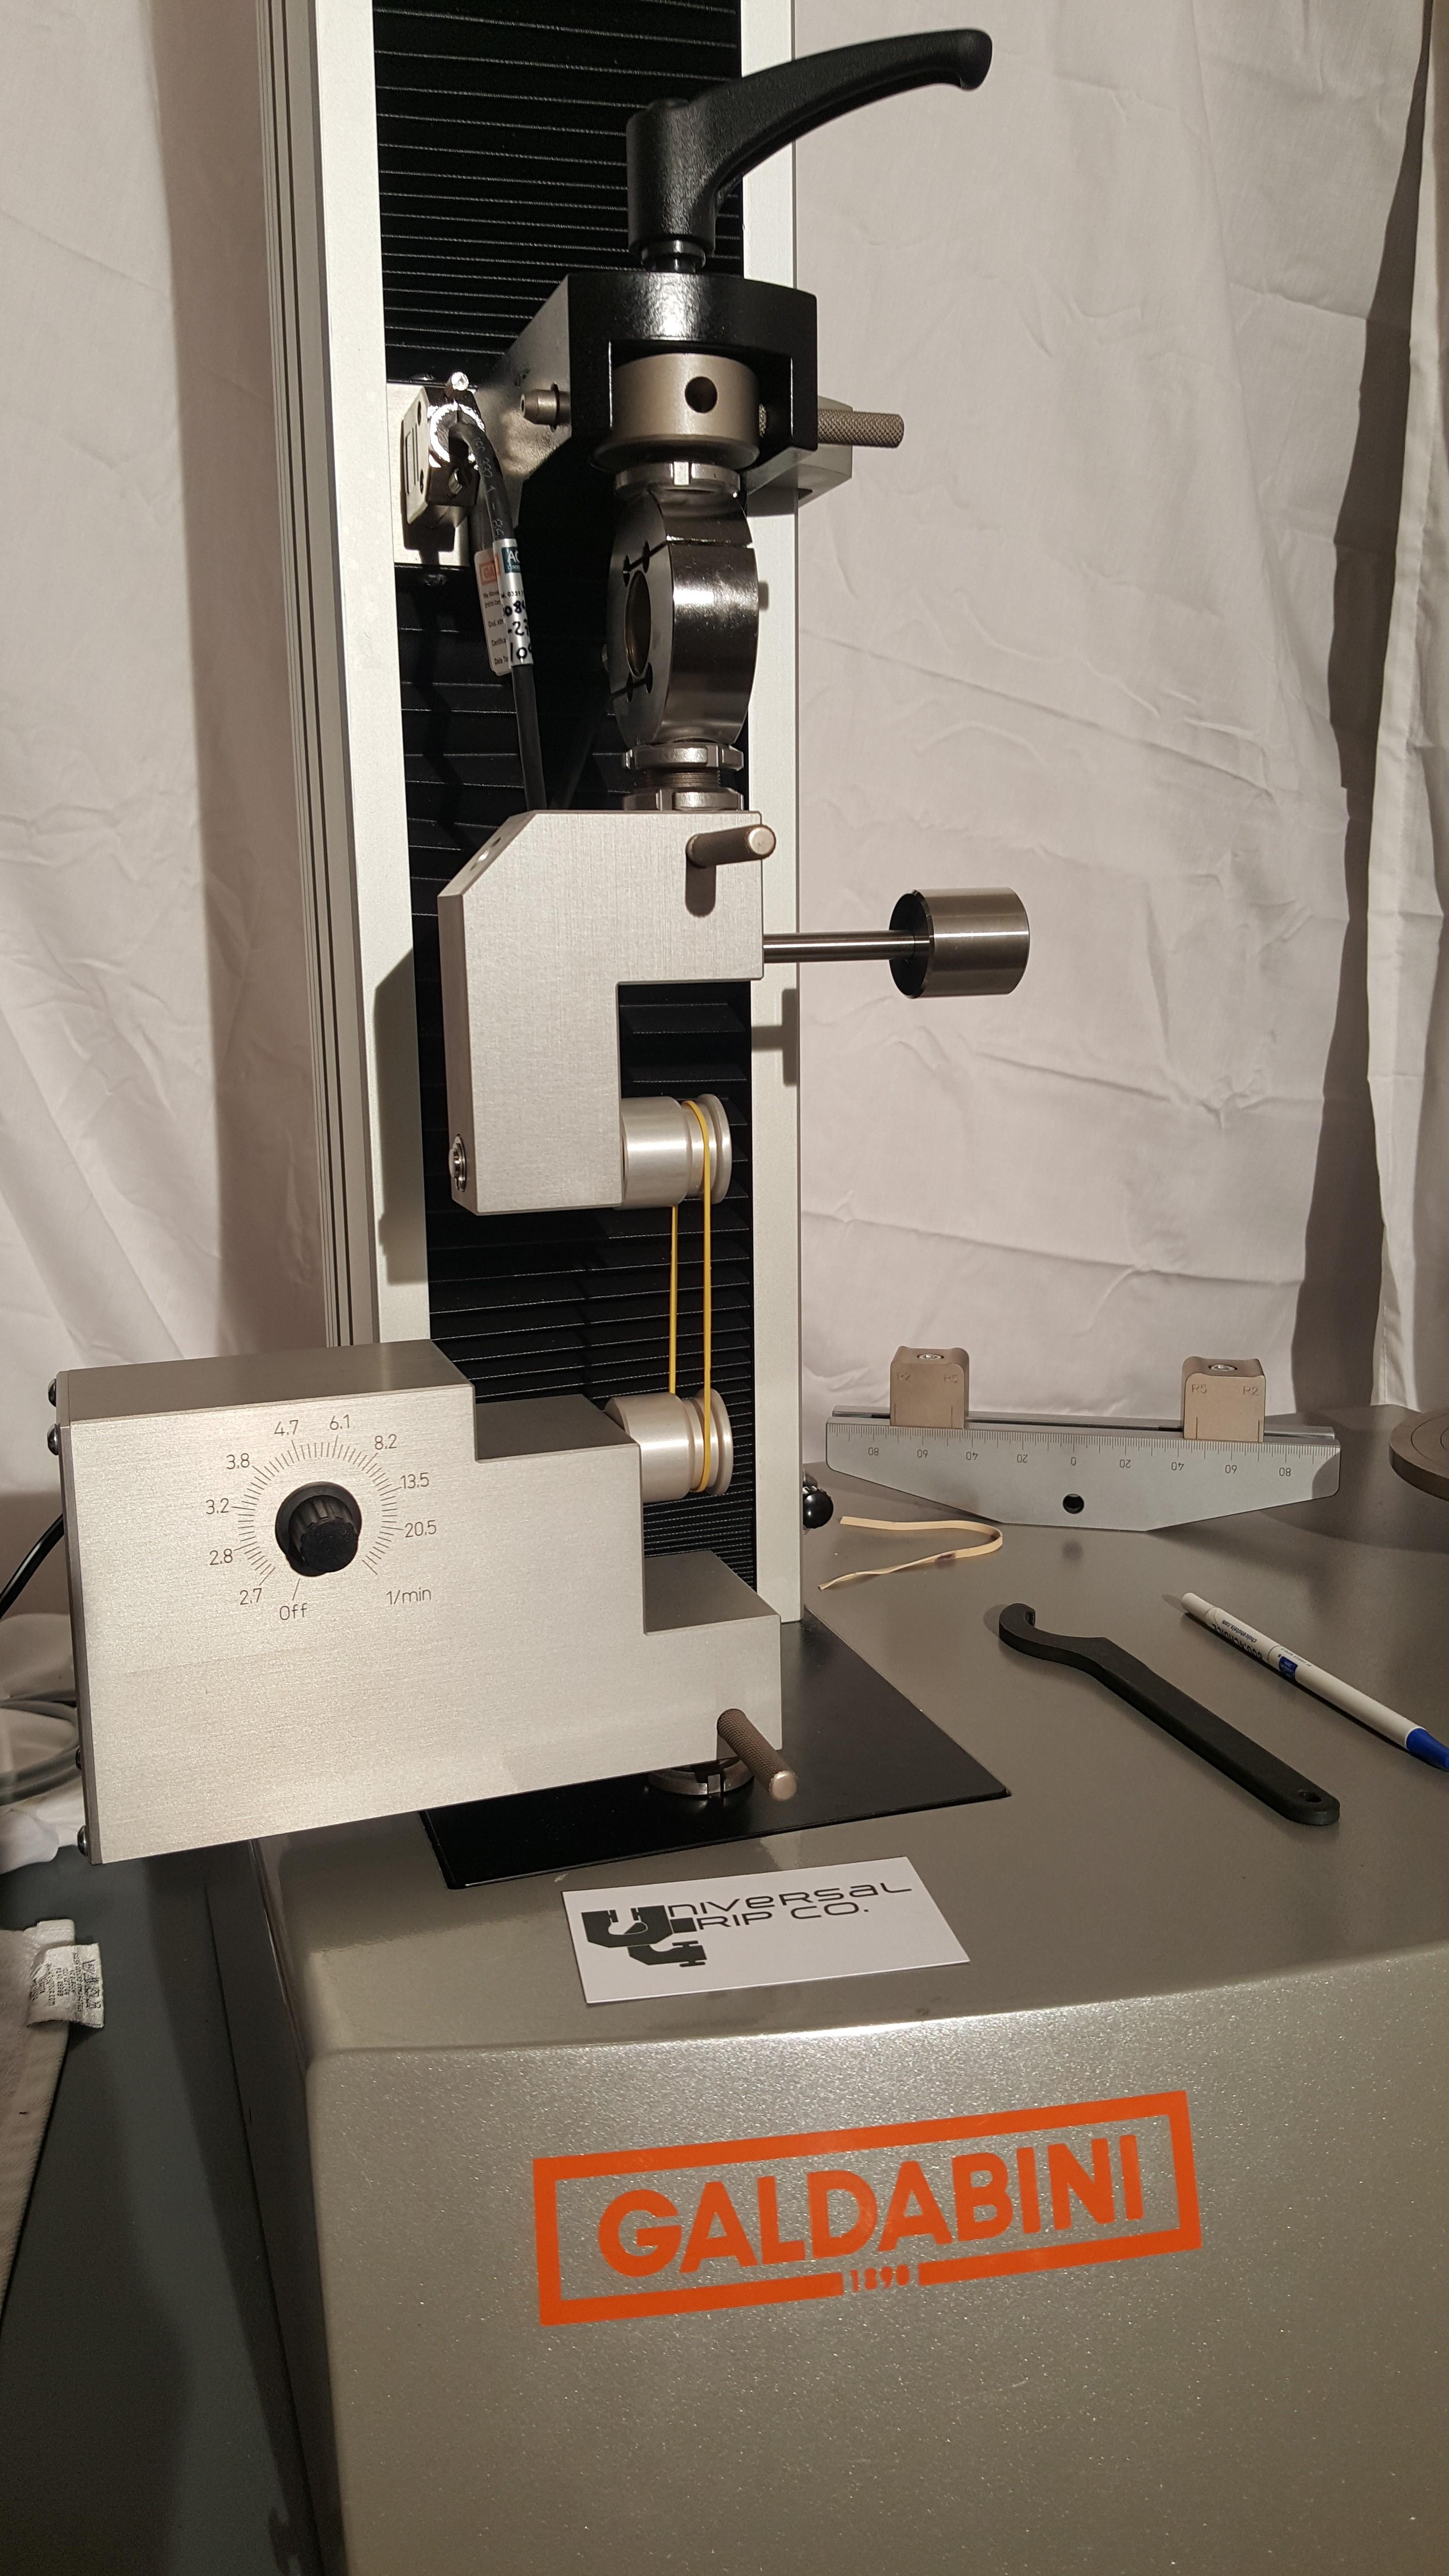 Motorized ASTM D1414 Testing Fixture